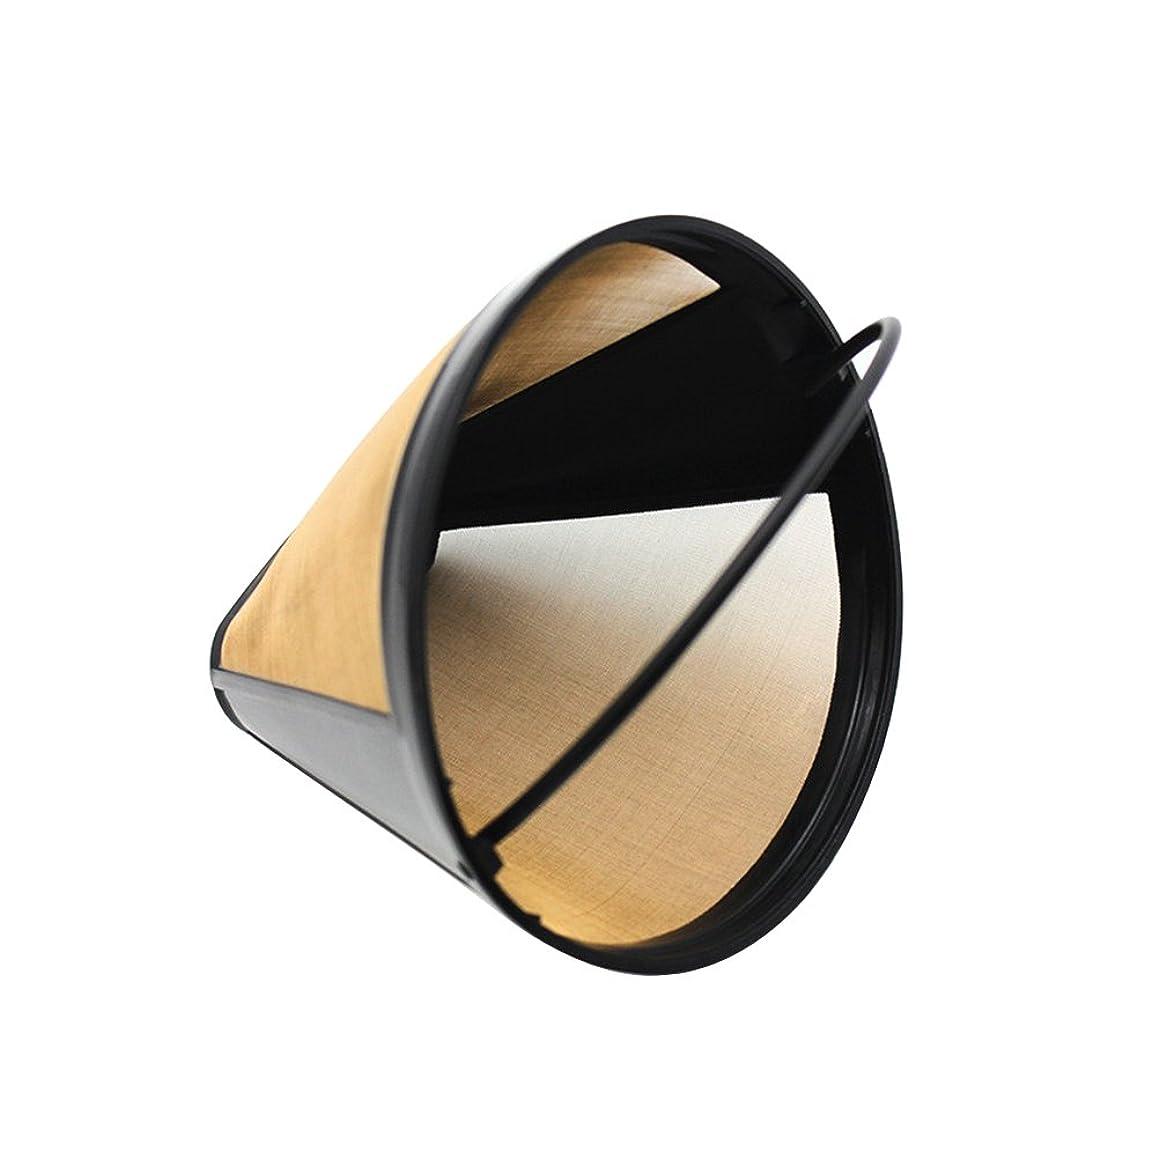 OUNONA Reusable Coffee Filter Cone Shape Coffee Filter Mesh Basket,Paperless Reusable(Golden)